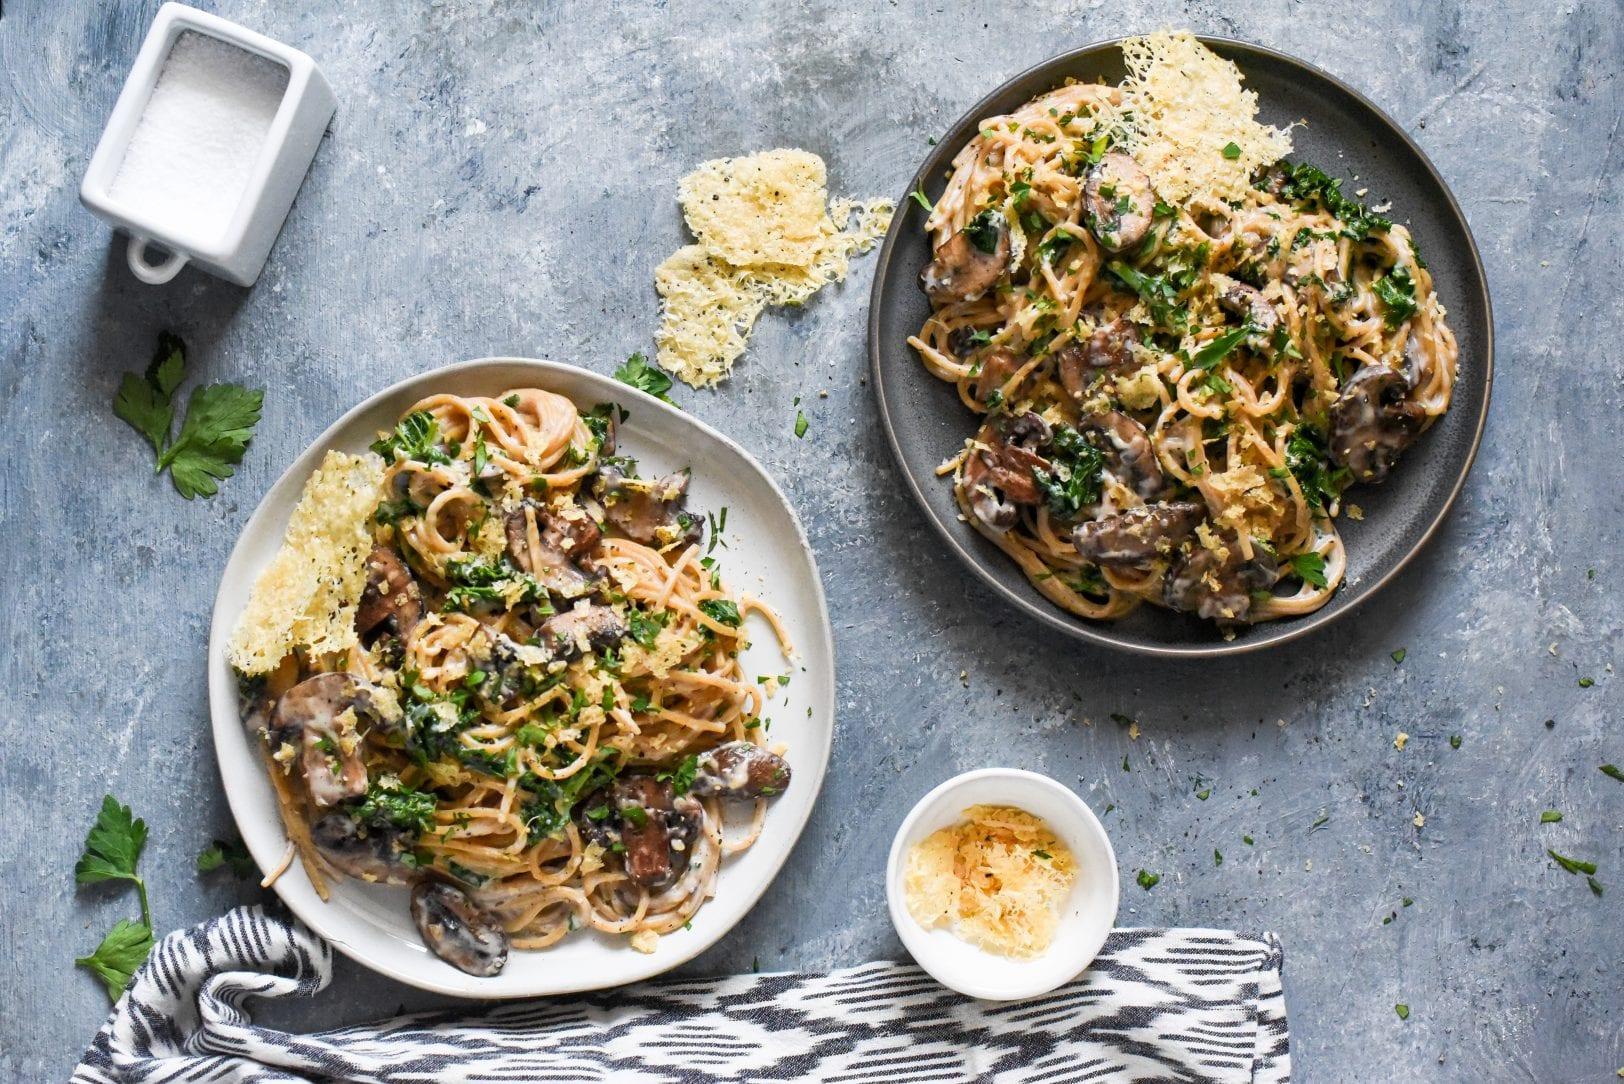 Weeknight Creamy Mushroom Kale Pasta